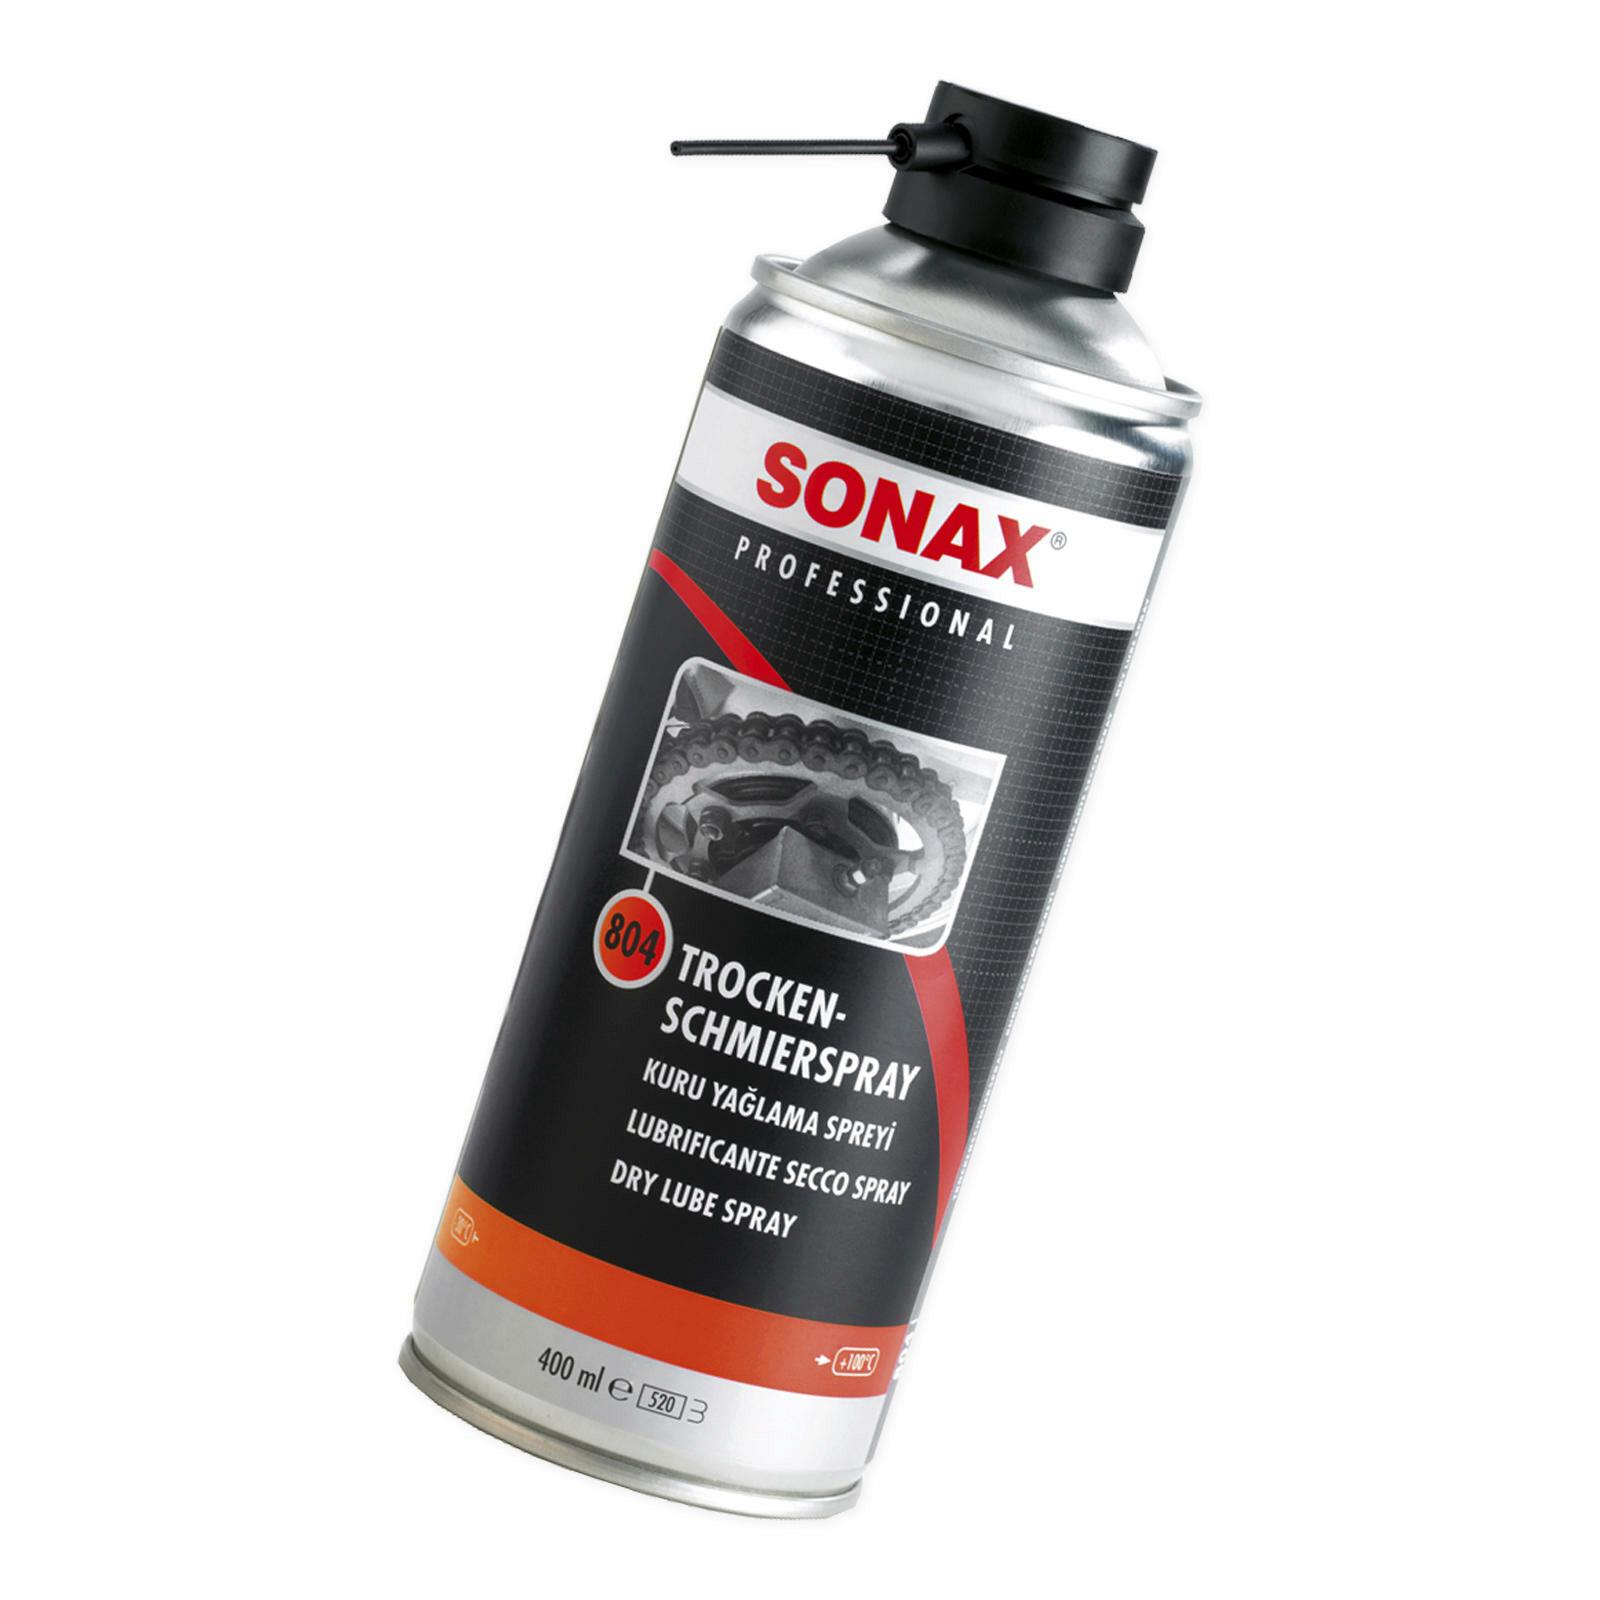 SONAX PROFESSIONAL TrockenSchmierSpray 400ml